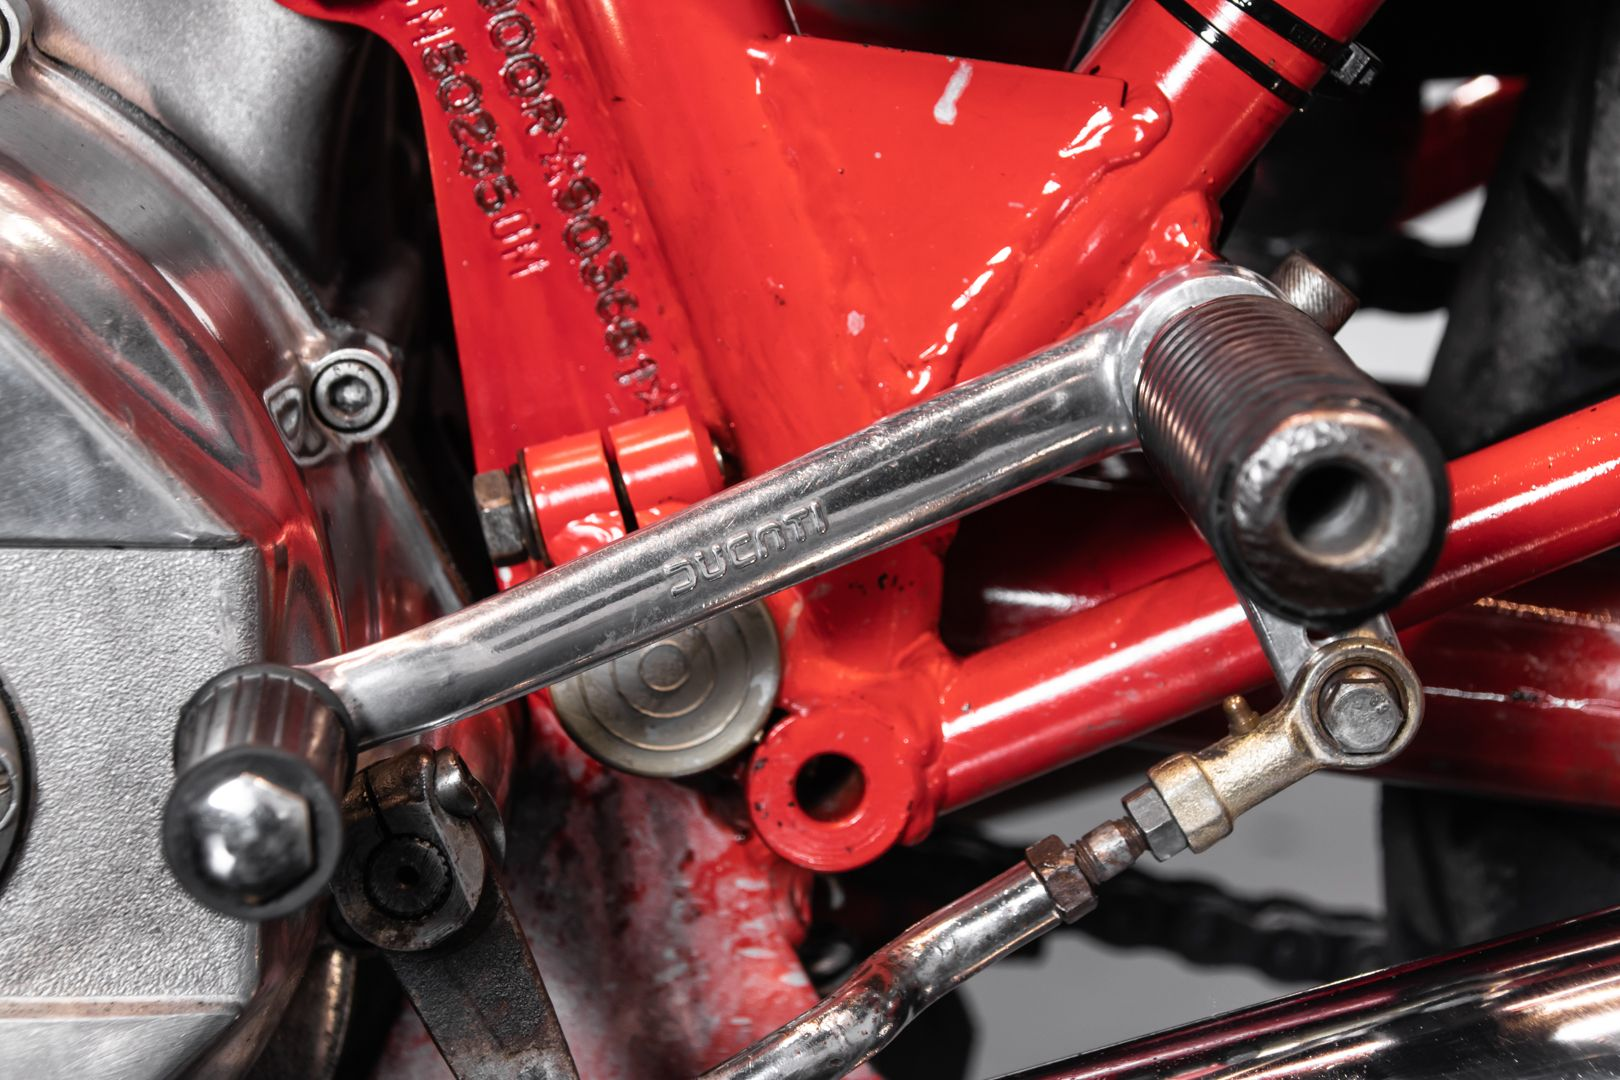 1983 Ducati 900 Mike Hailwood Replica 71427